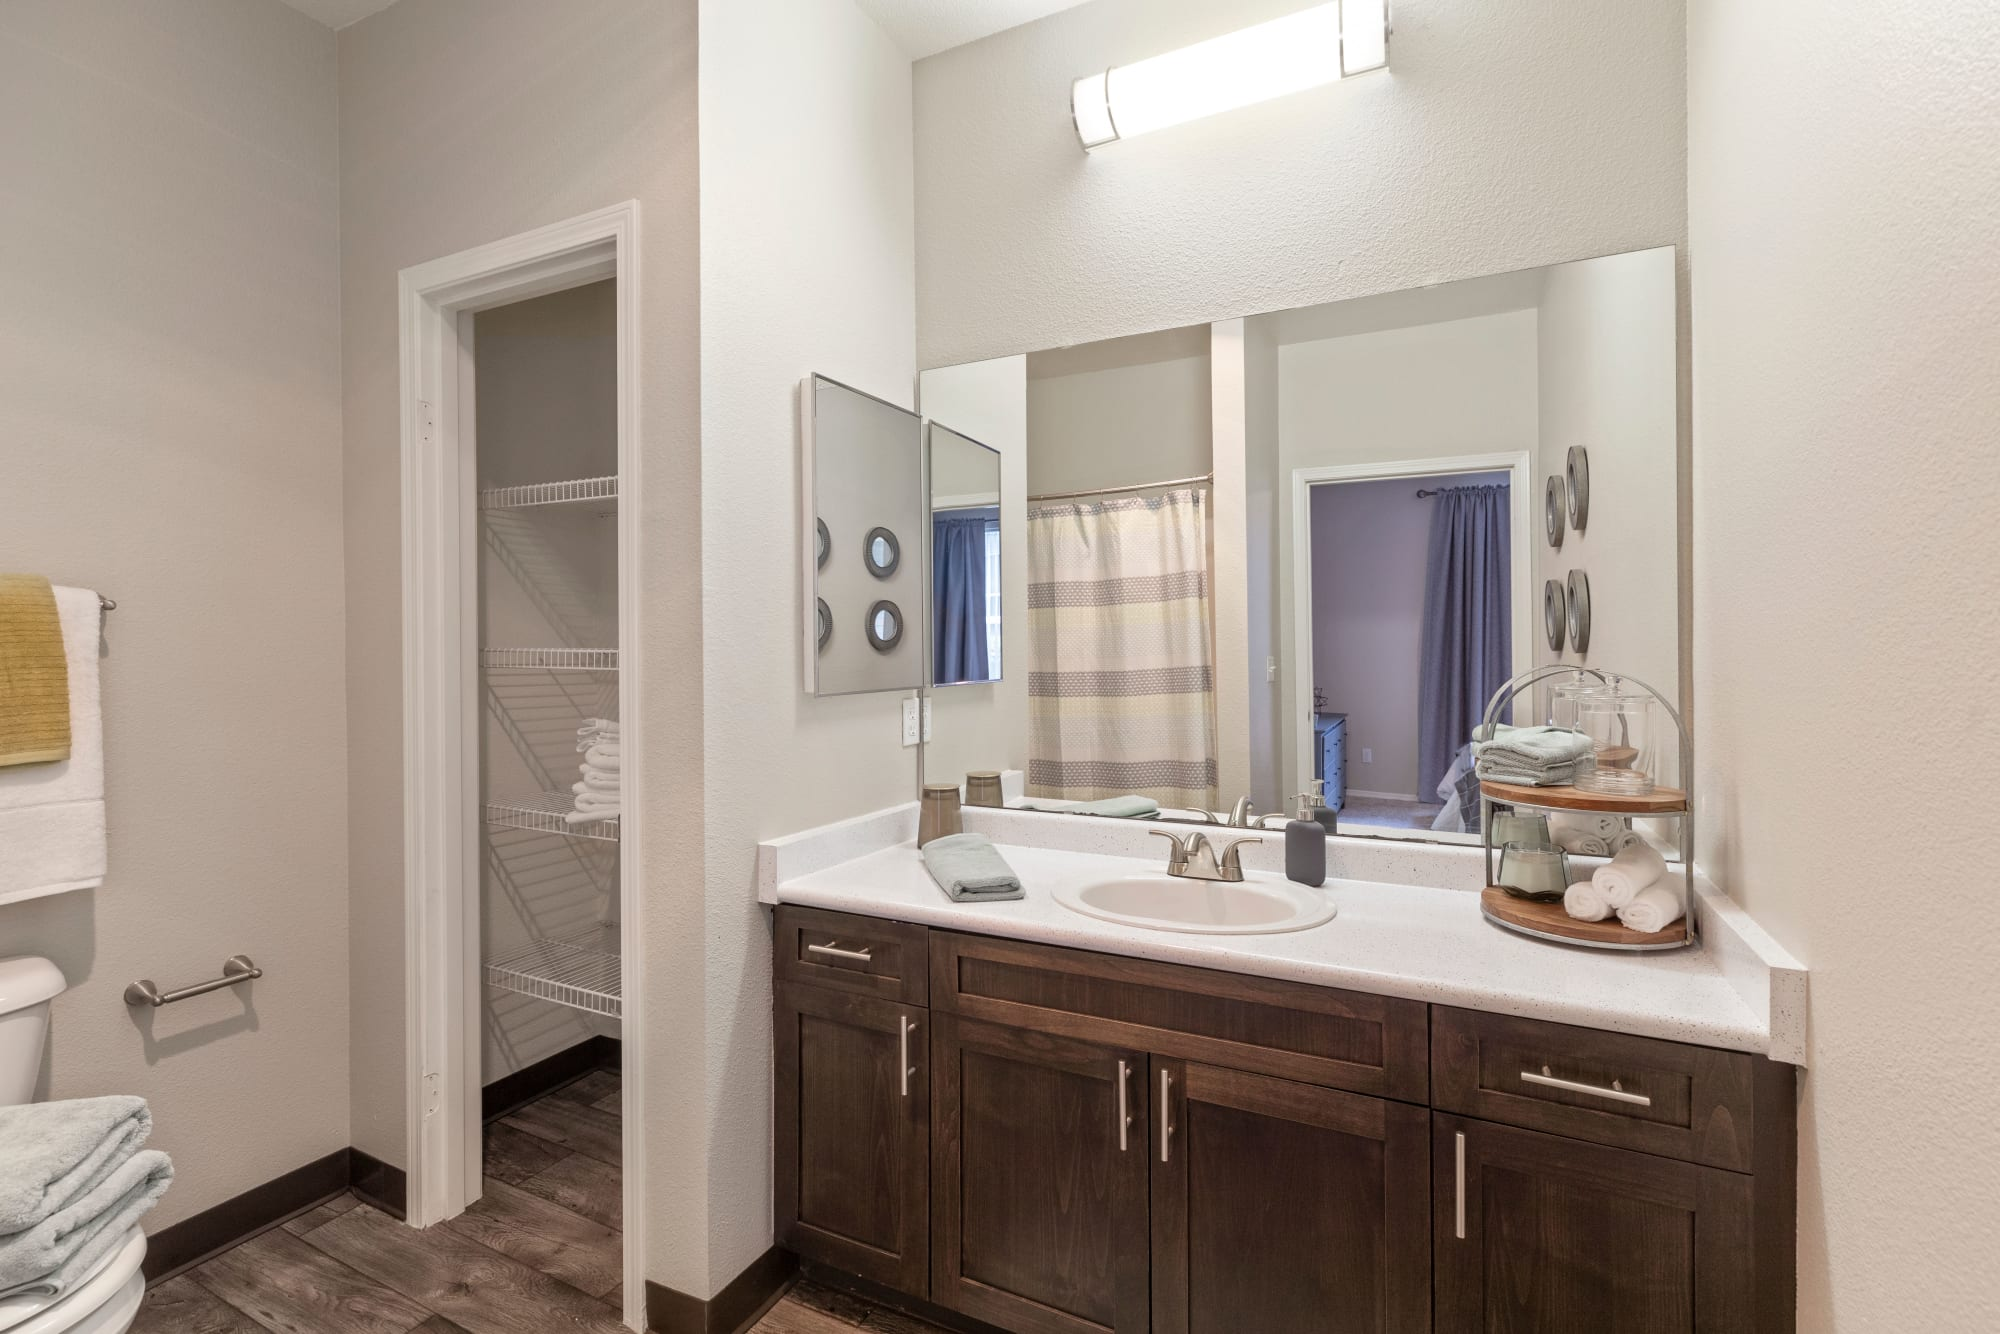 A master bathroom at HighGrove Apartments in Everett, Washington